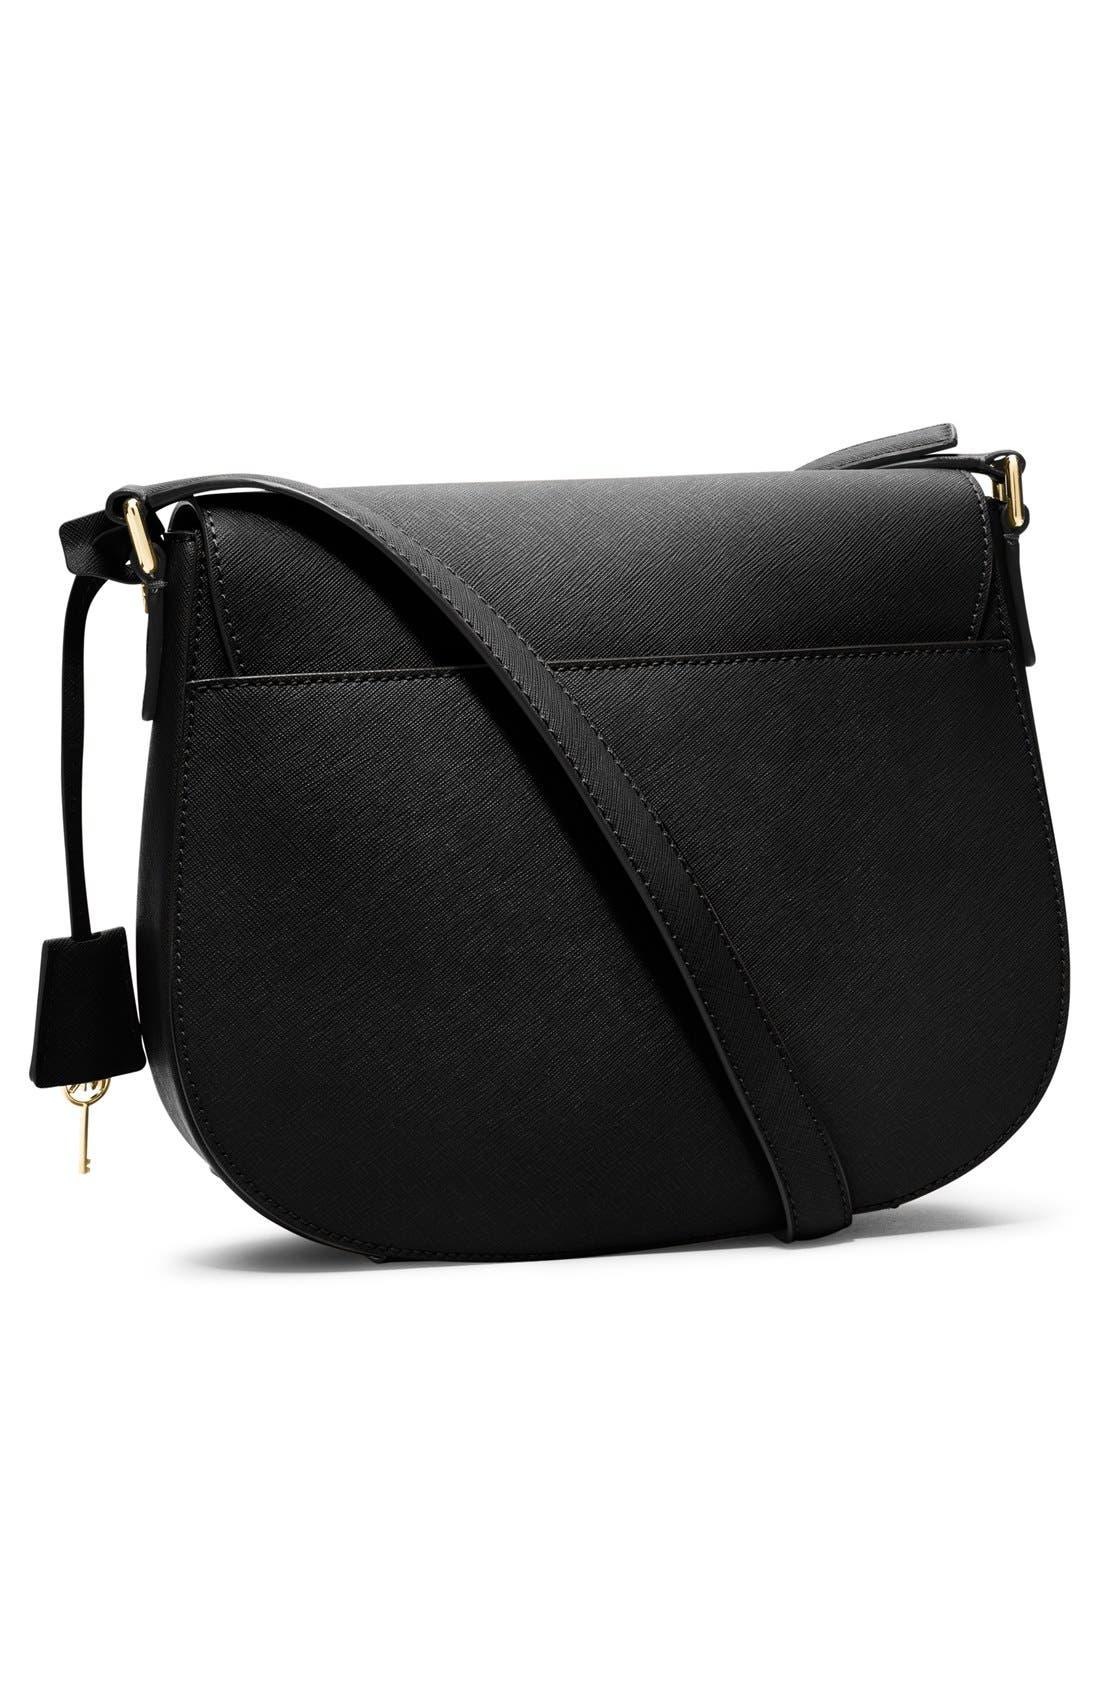 Alternate Image 3  - MICHAEL Michael Kors 'Large' Saffiano Leather Messenger Bag